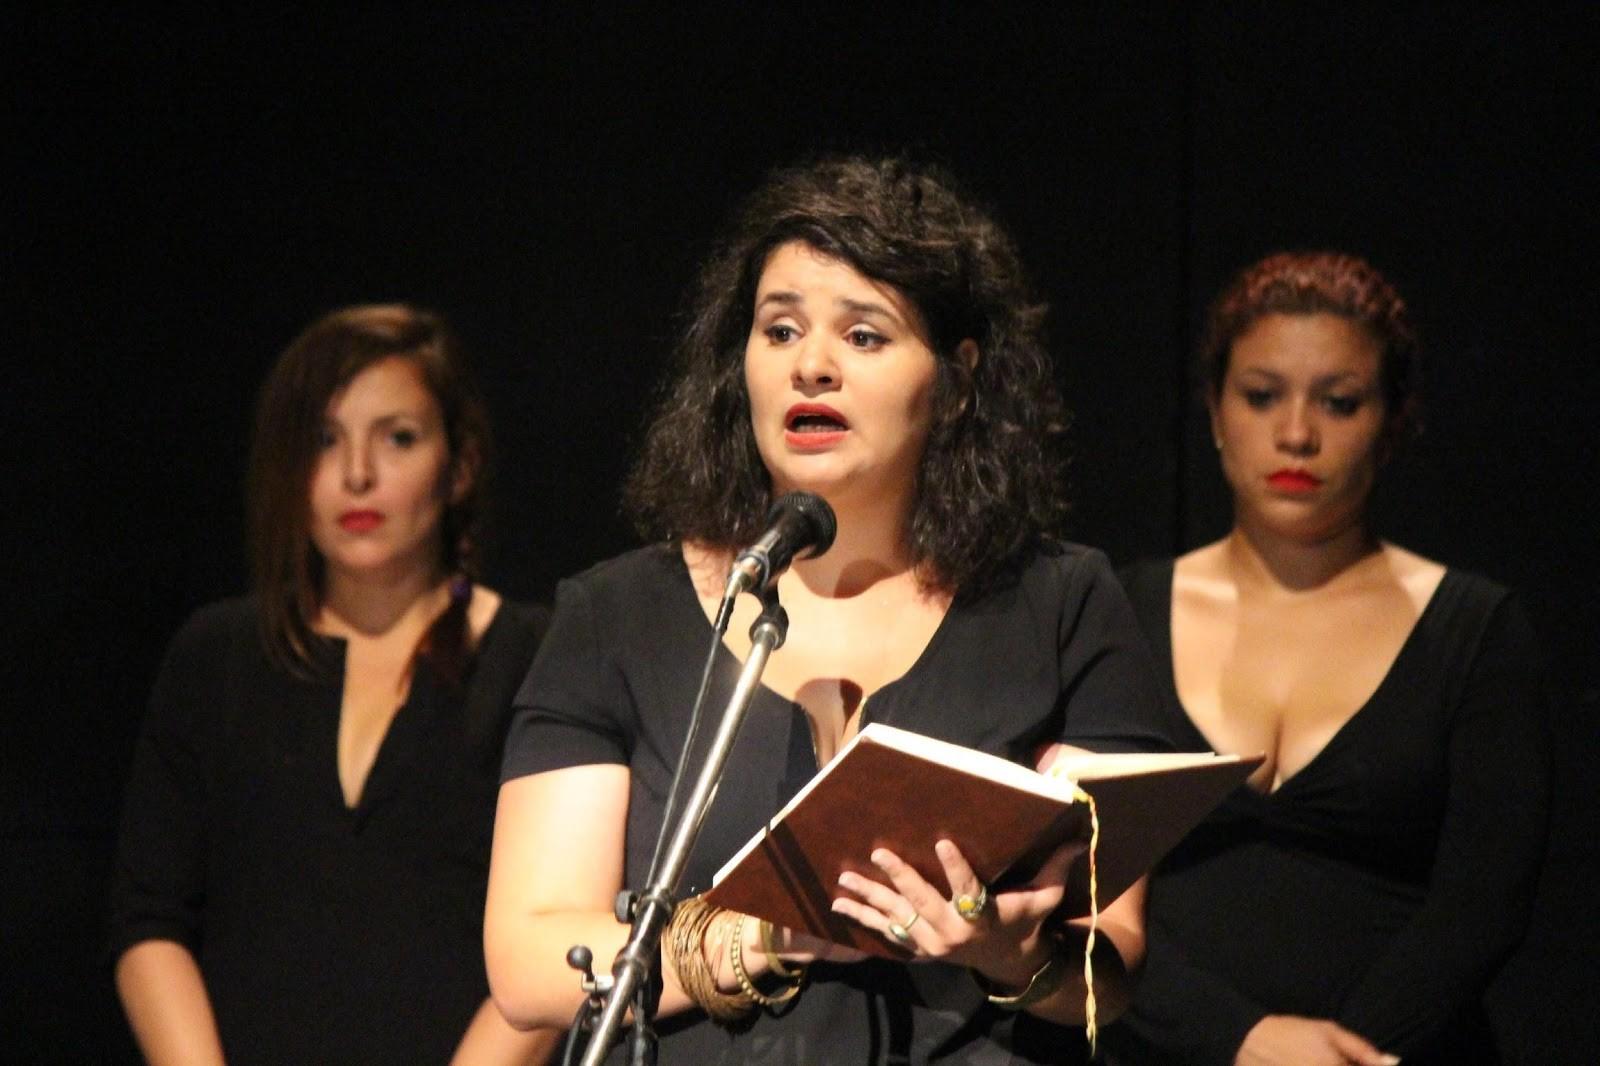 Wissal Labidi, Marwa Mannai, Nesrine Mouelhi